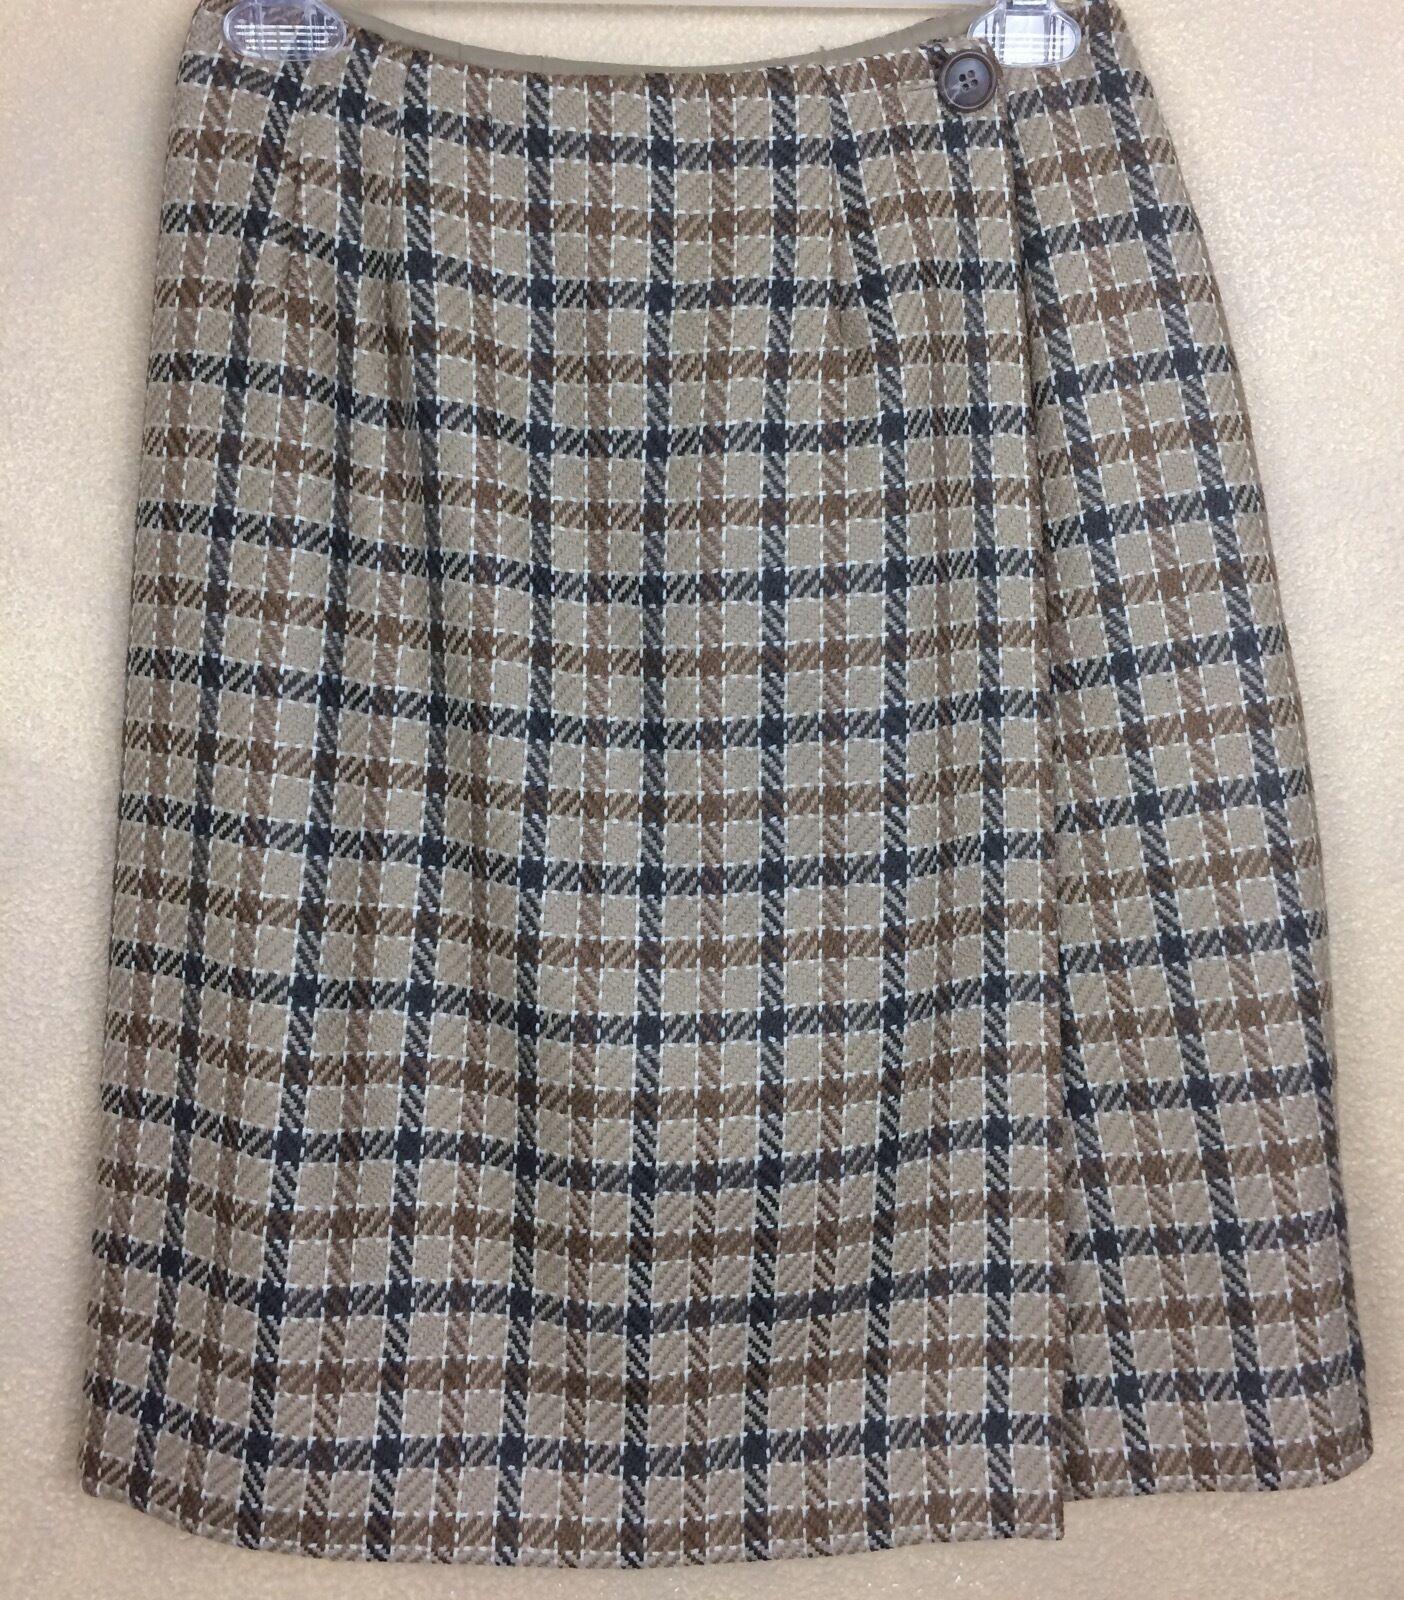 Vintage 80's Ann Taylor Plaid Wrap Skirt Wool Mohair Blend Size 6